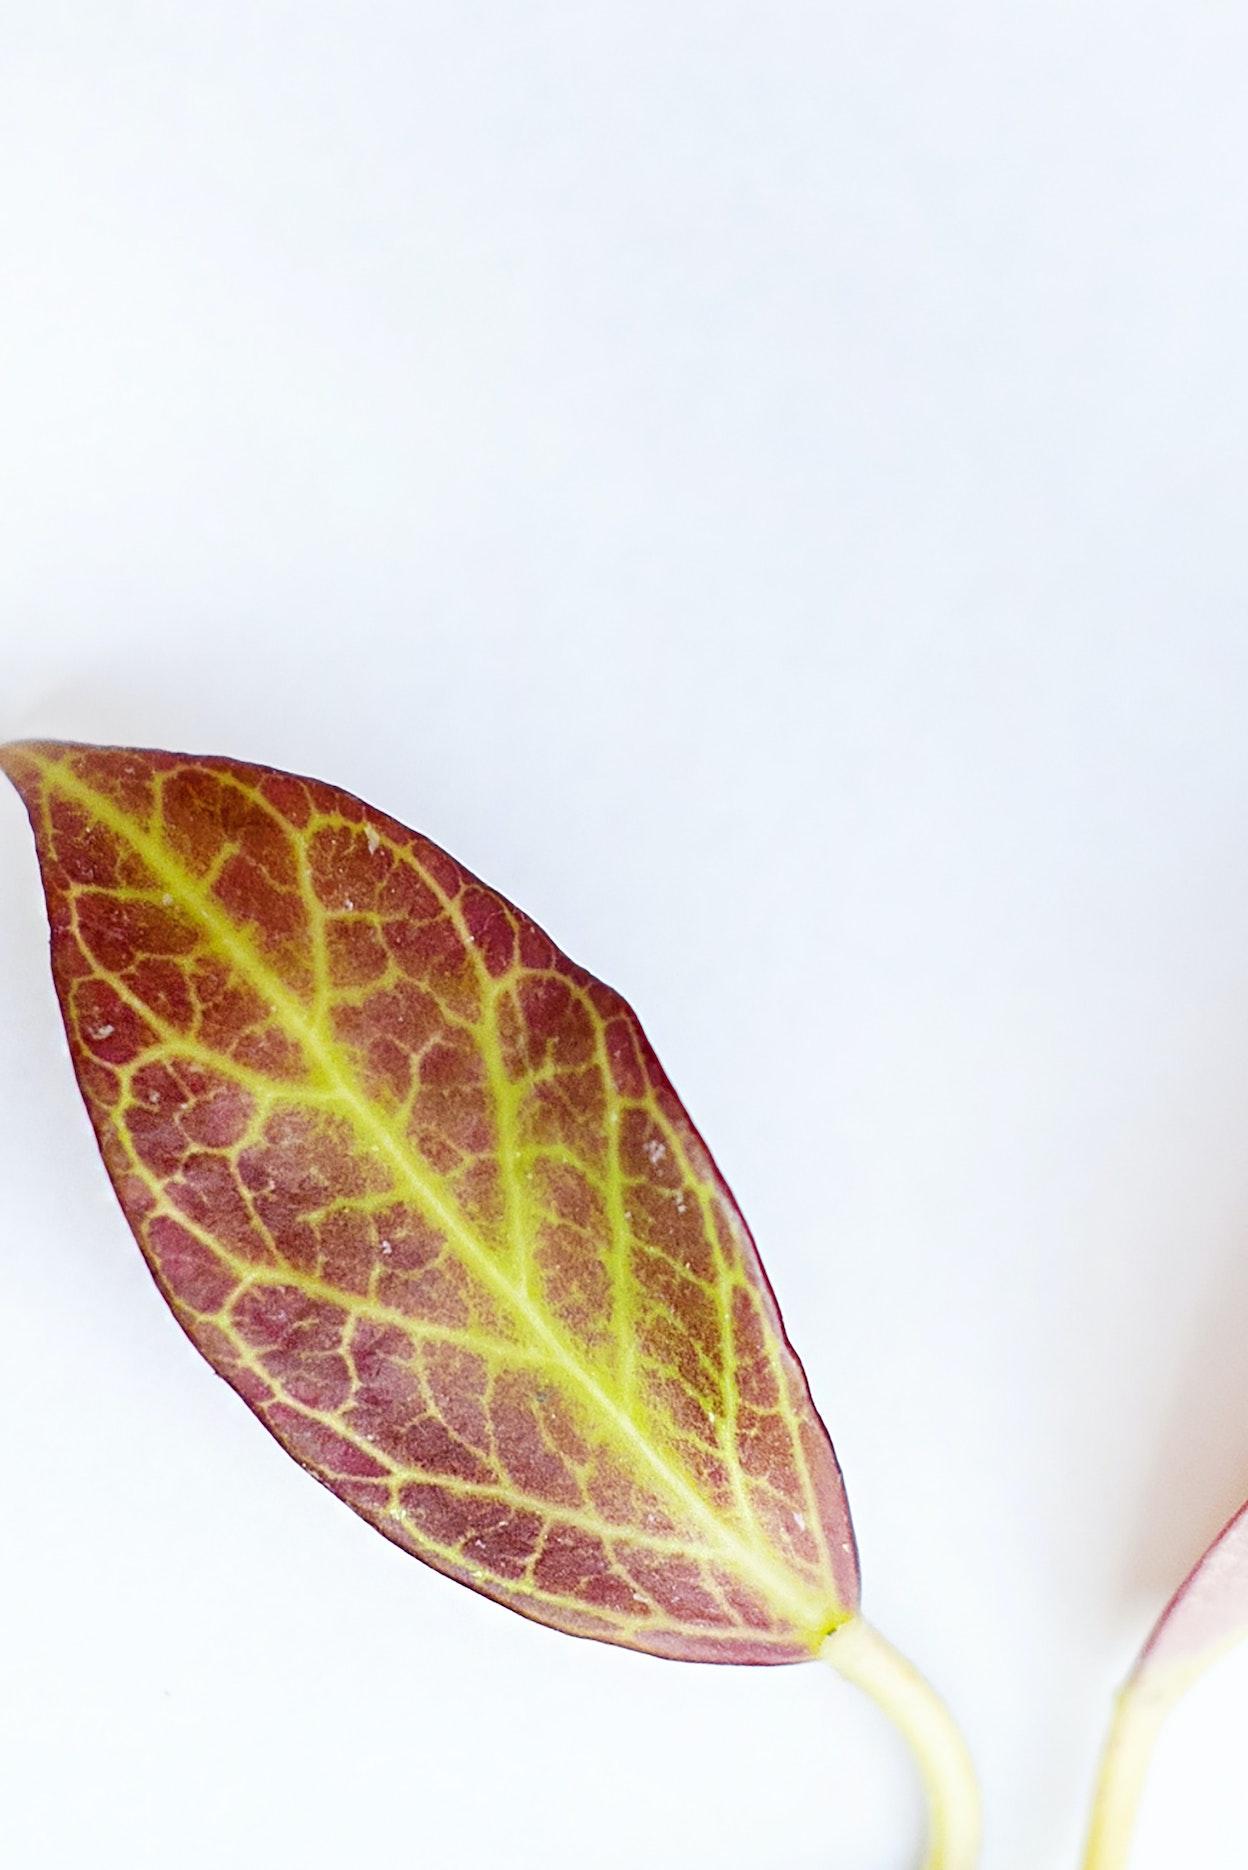 Hoya leaf